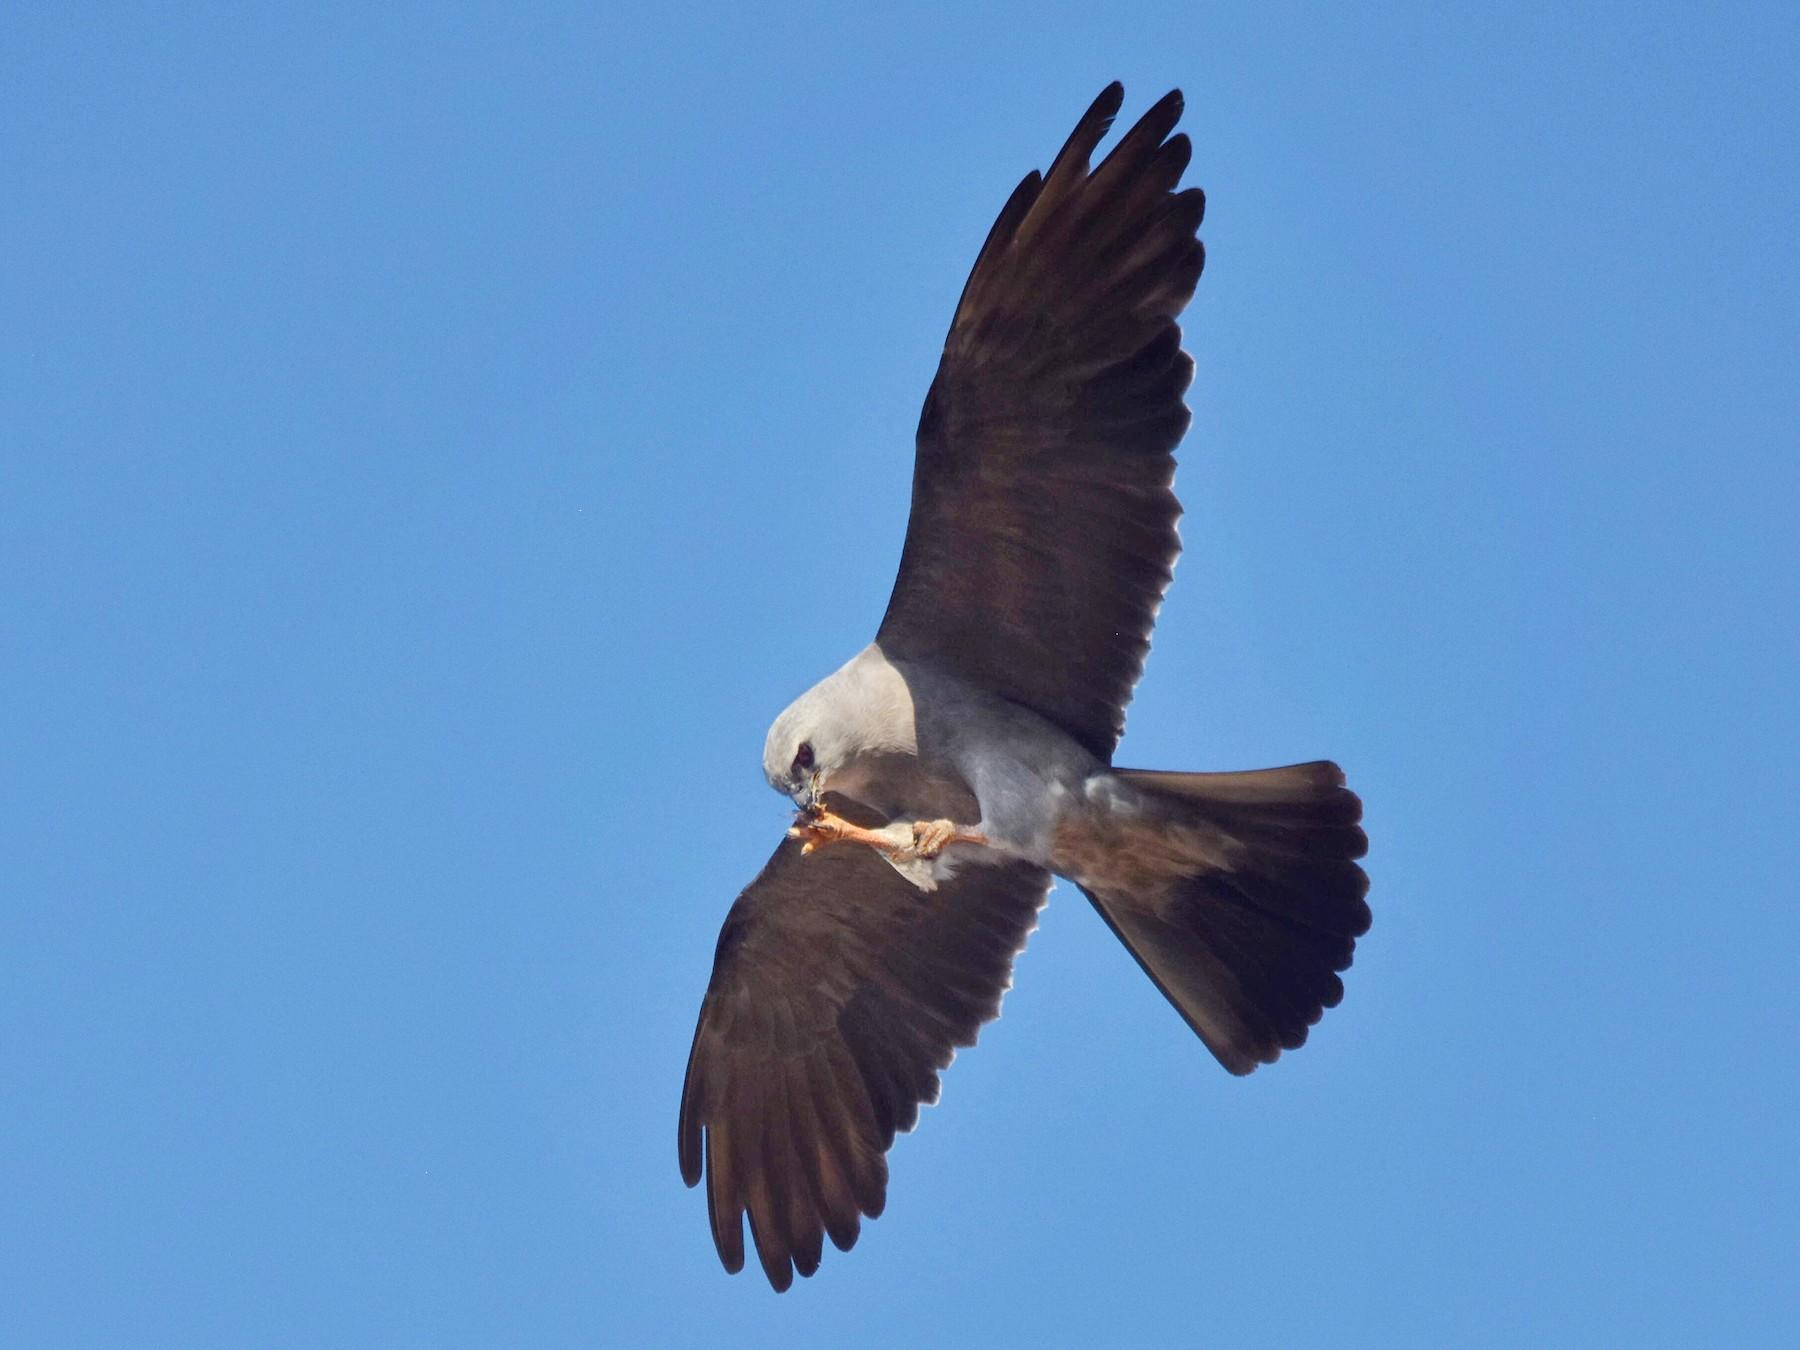 Mississippi Kite - Marky Mutchler